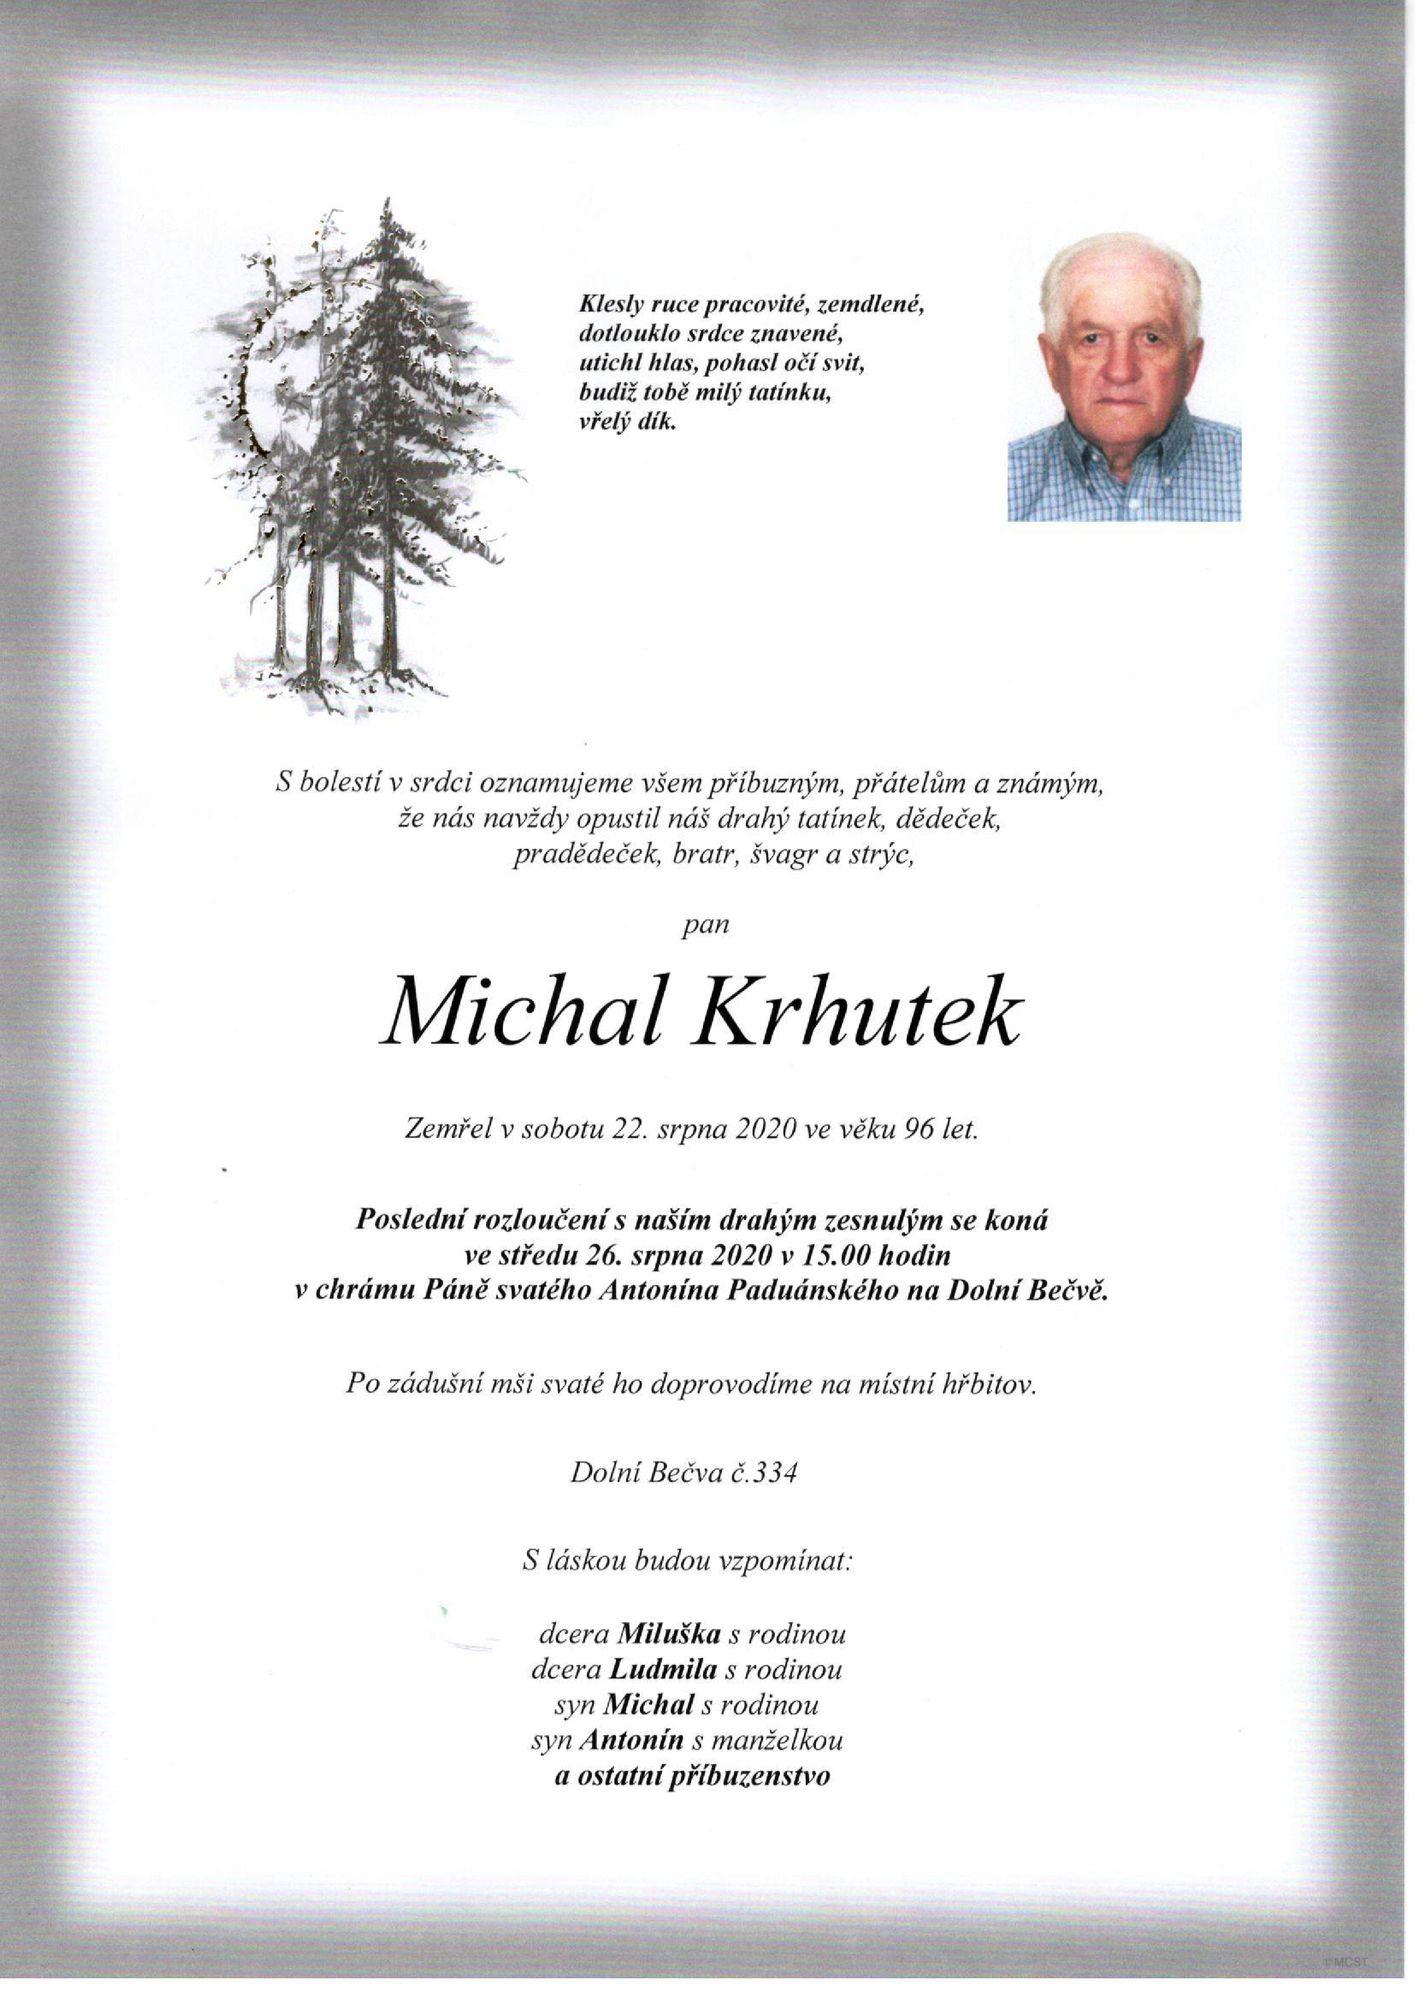 Michal Krhutek